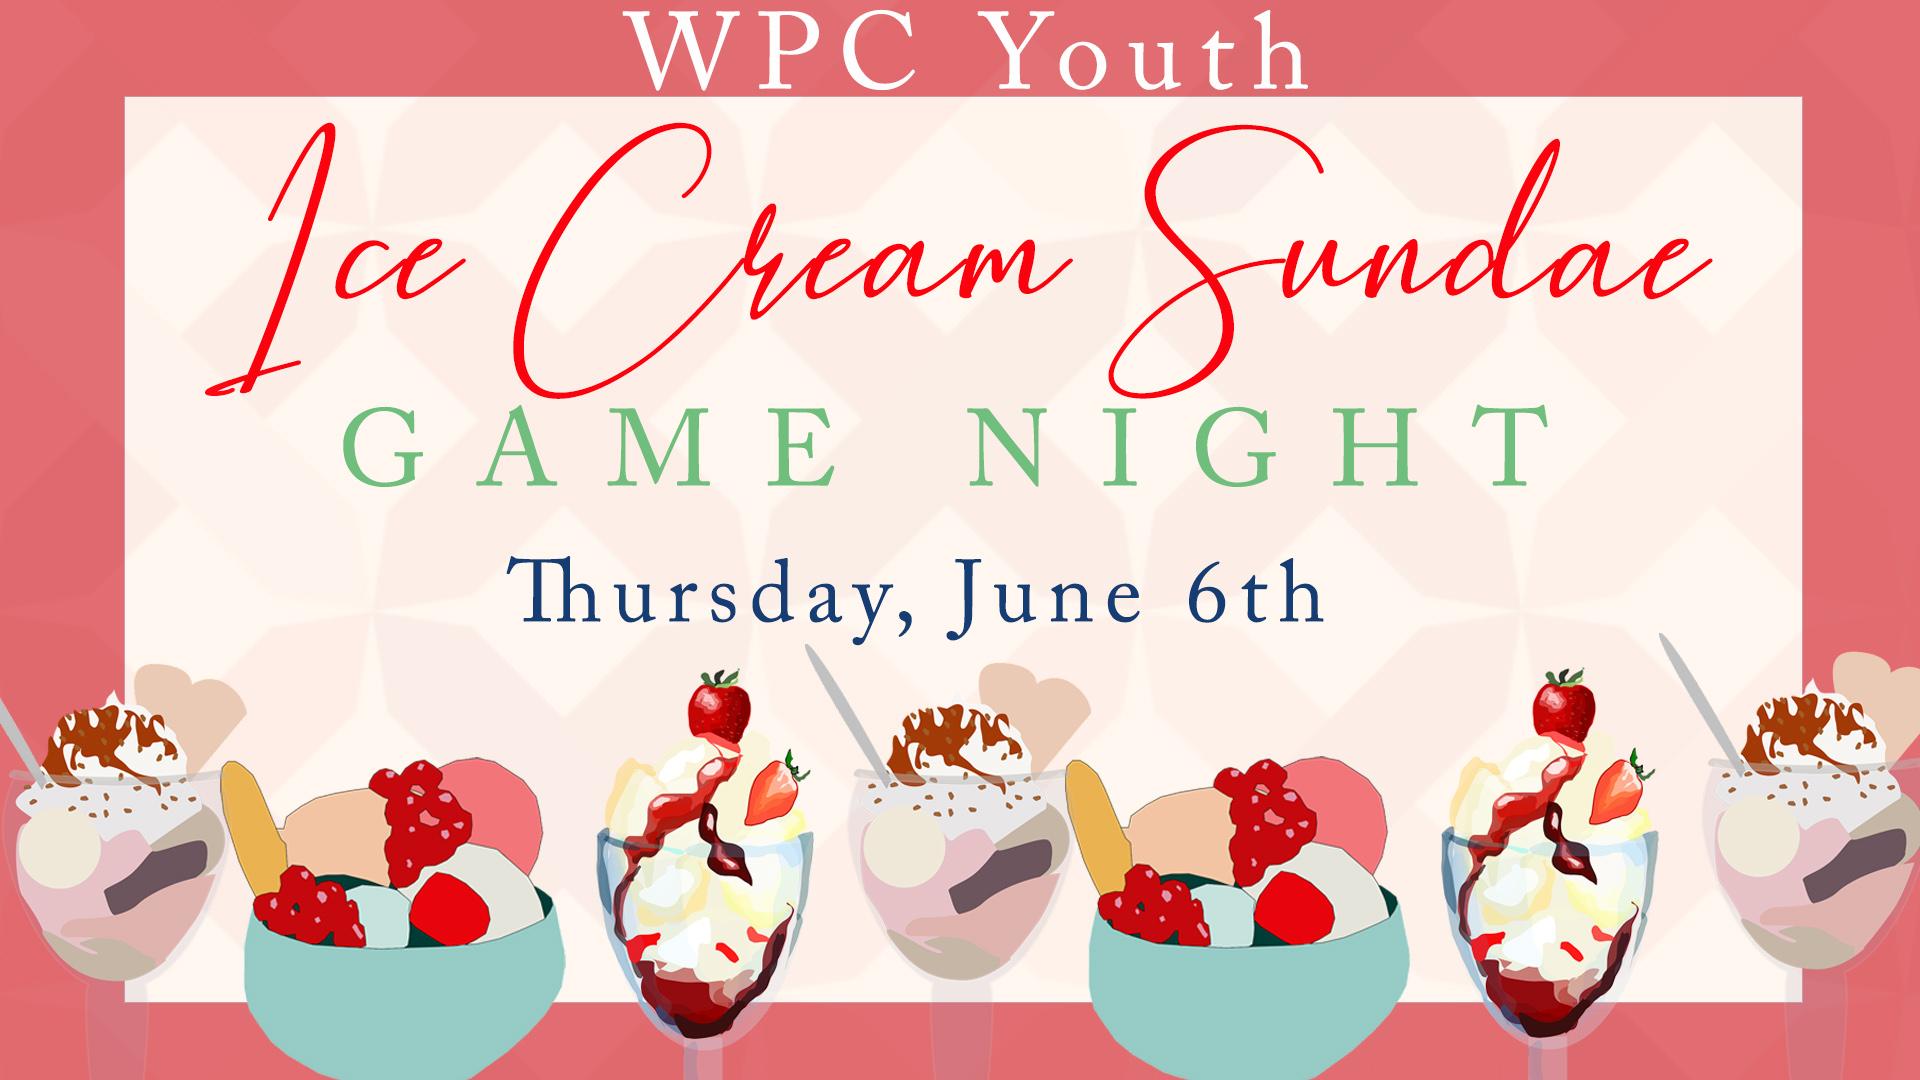 Ice Cream Game Night